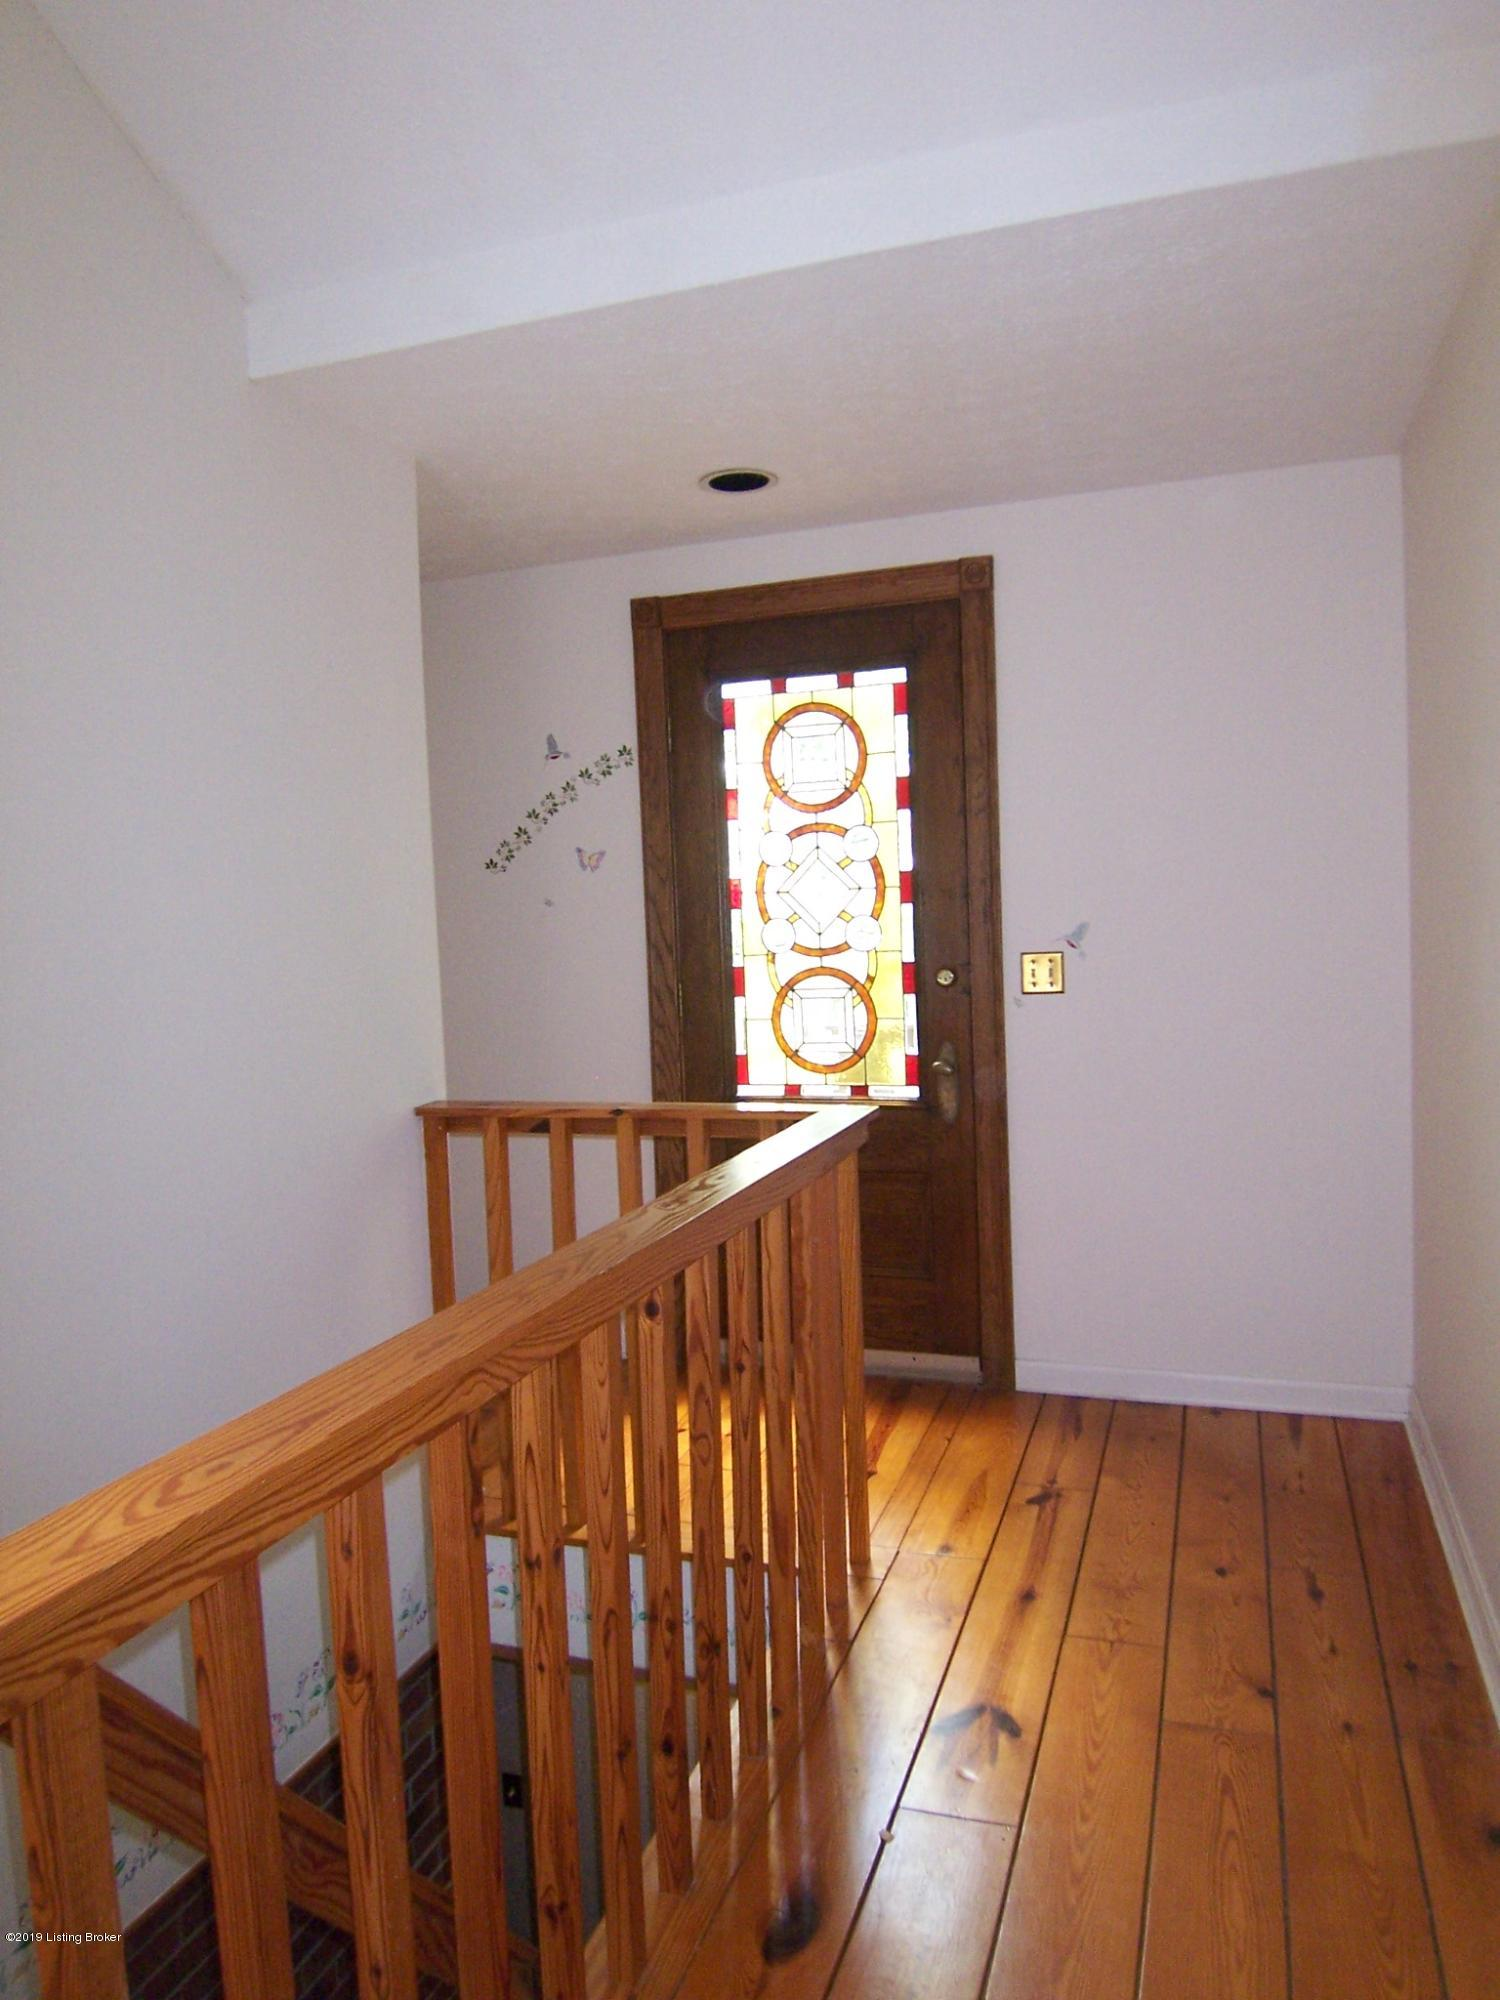 430 T Hahn Rd, Coxs Creek, Kentucky 40013, 3 Bedrooms Bedrooms, 6 Rooms Rooms,3 BathroomsBathrooms,Residential,For Sale,T Hahn,1531374